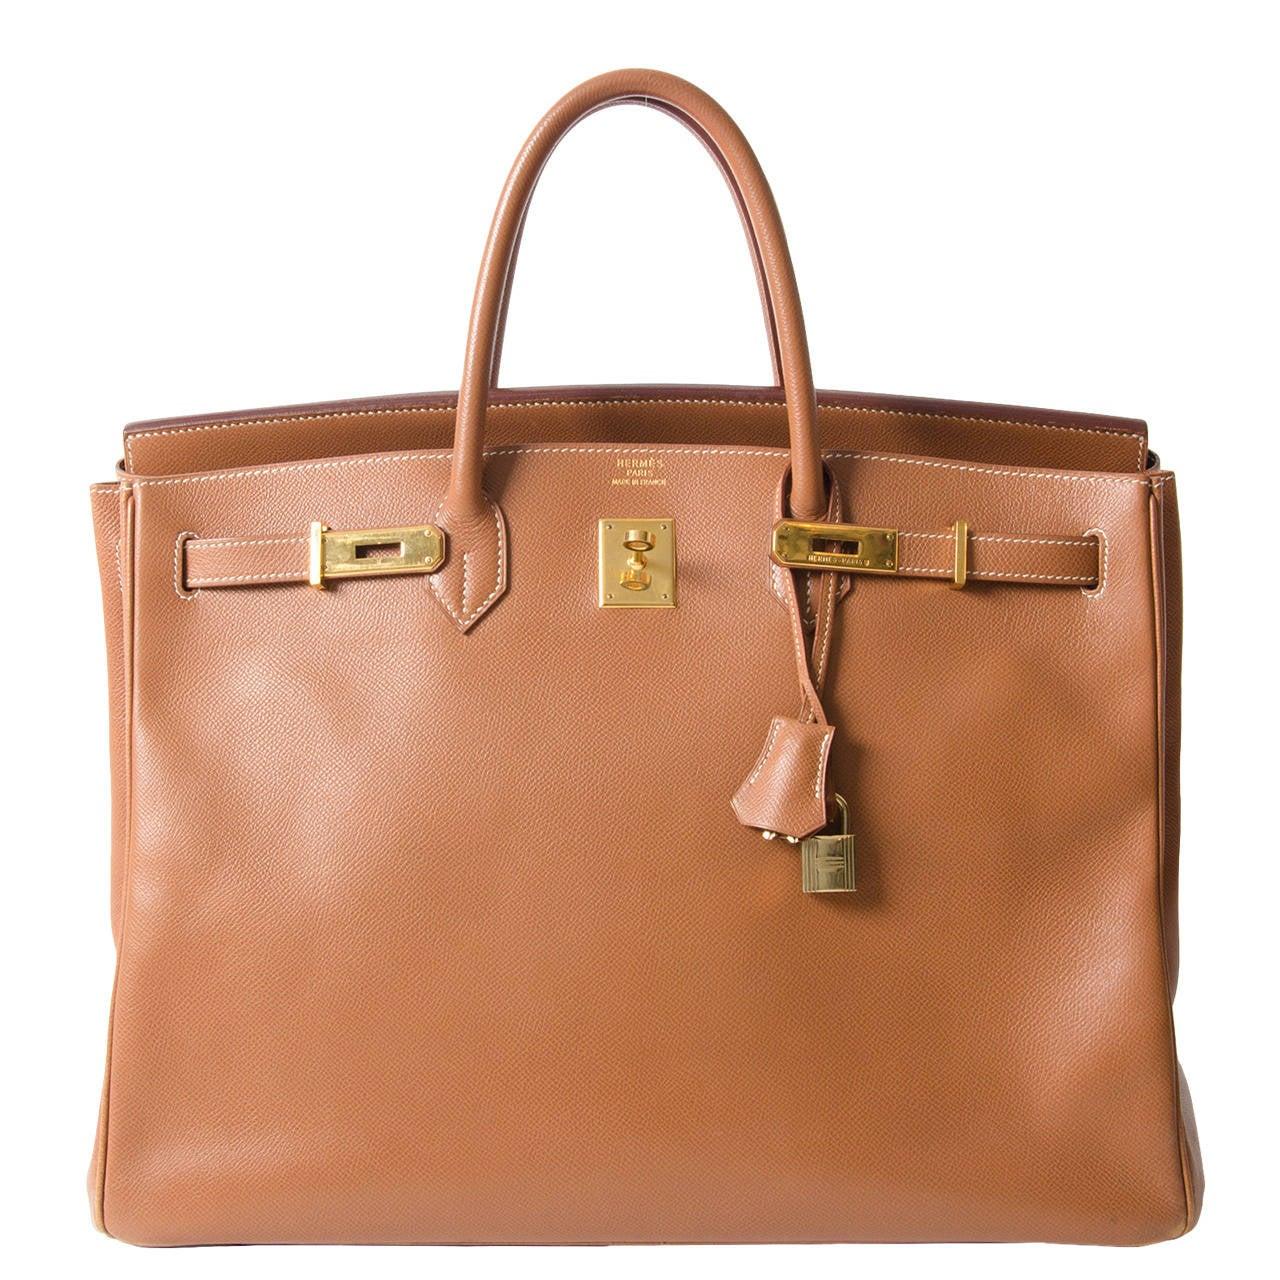 Hermès Birkin Bag Gold Courchevel GHW 40 at 1stdibs 4bddb733b99ee